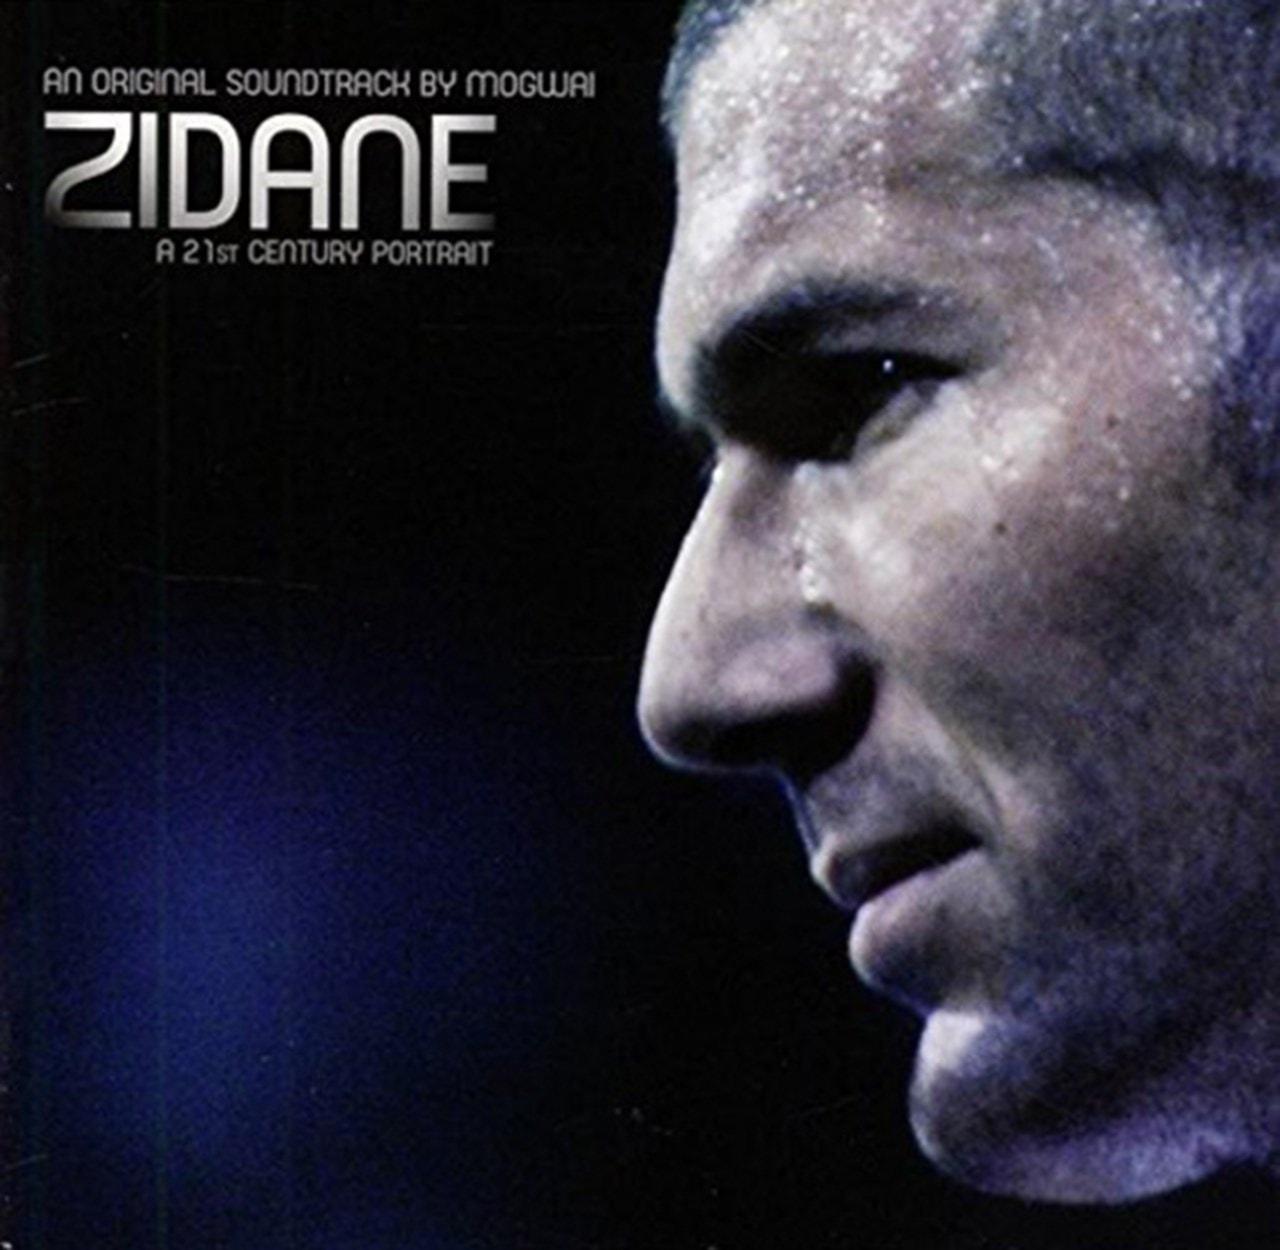 Zidane - A 21st Century Portait - 1